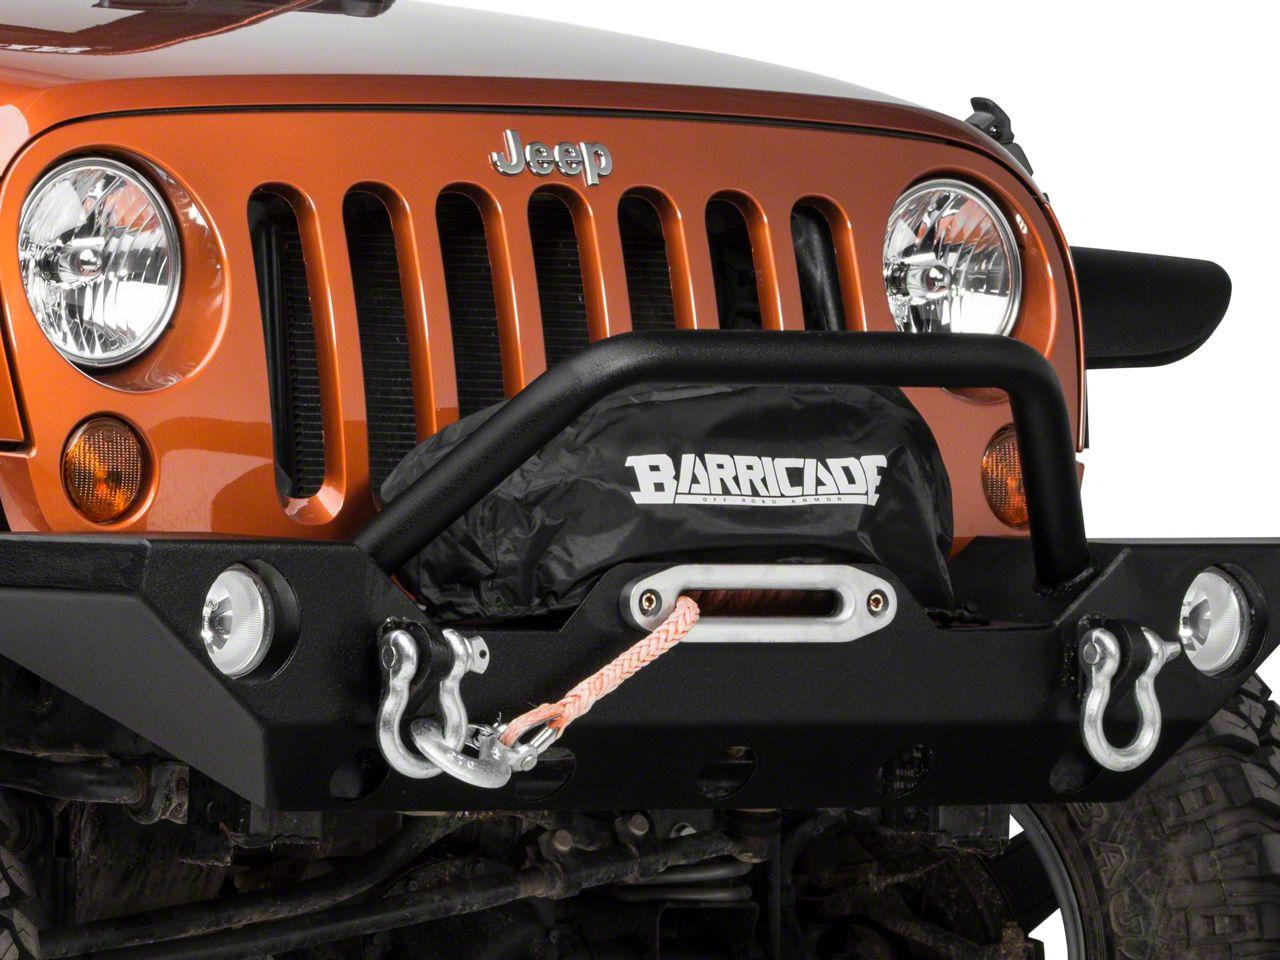 Barricade Winch Cover (87-18 Jeep Wrangler YJ, TJ, JK & JL)